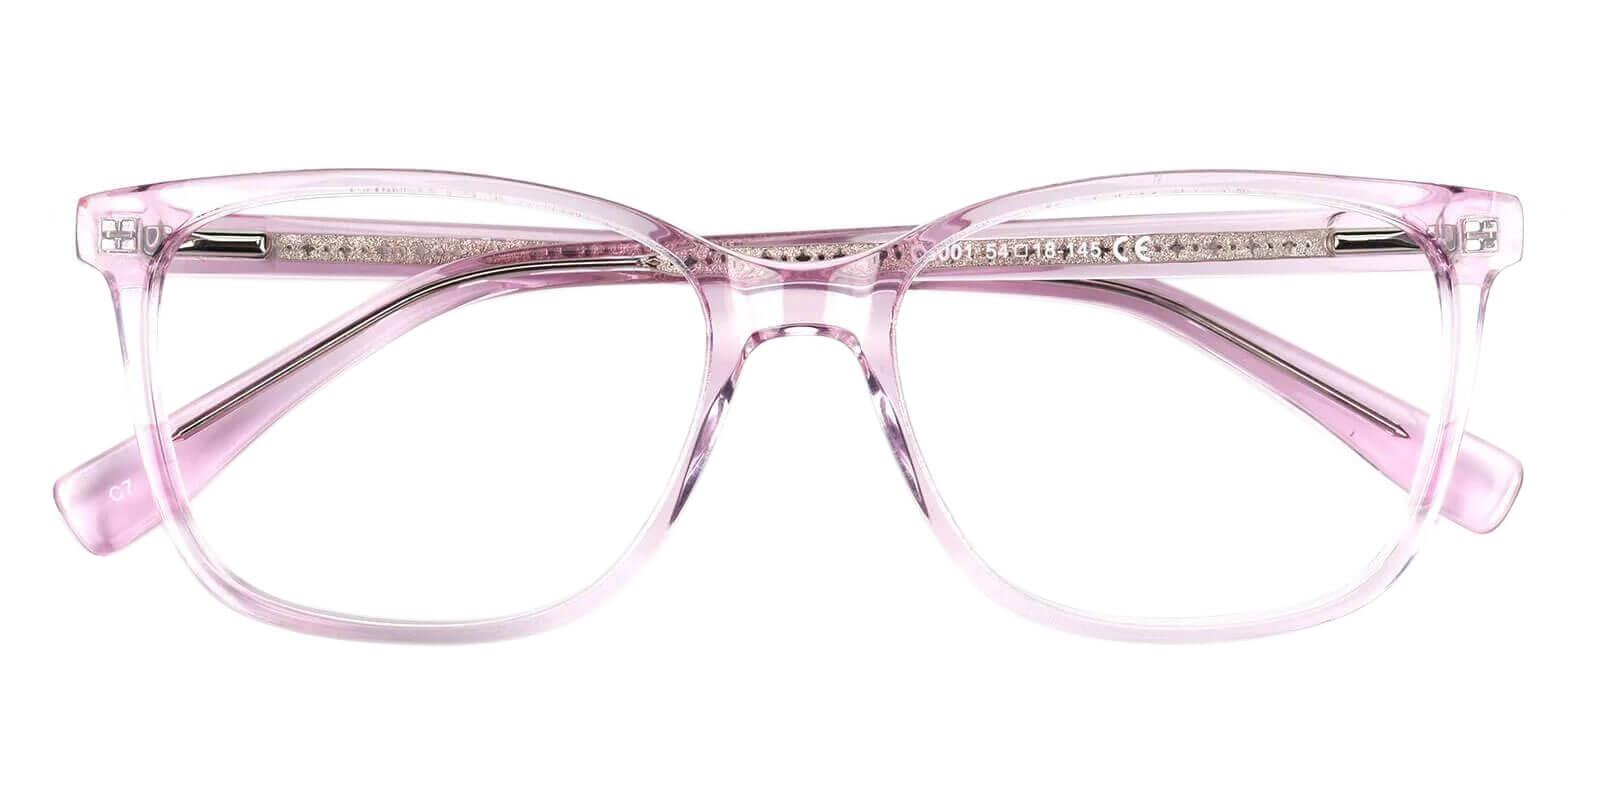 Groove Pink Acetate Eyeglasses , SpringHinges , UniversalBridgeFit Frames from ABBE Glasses